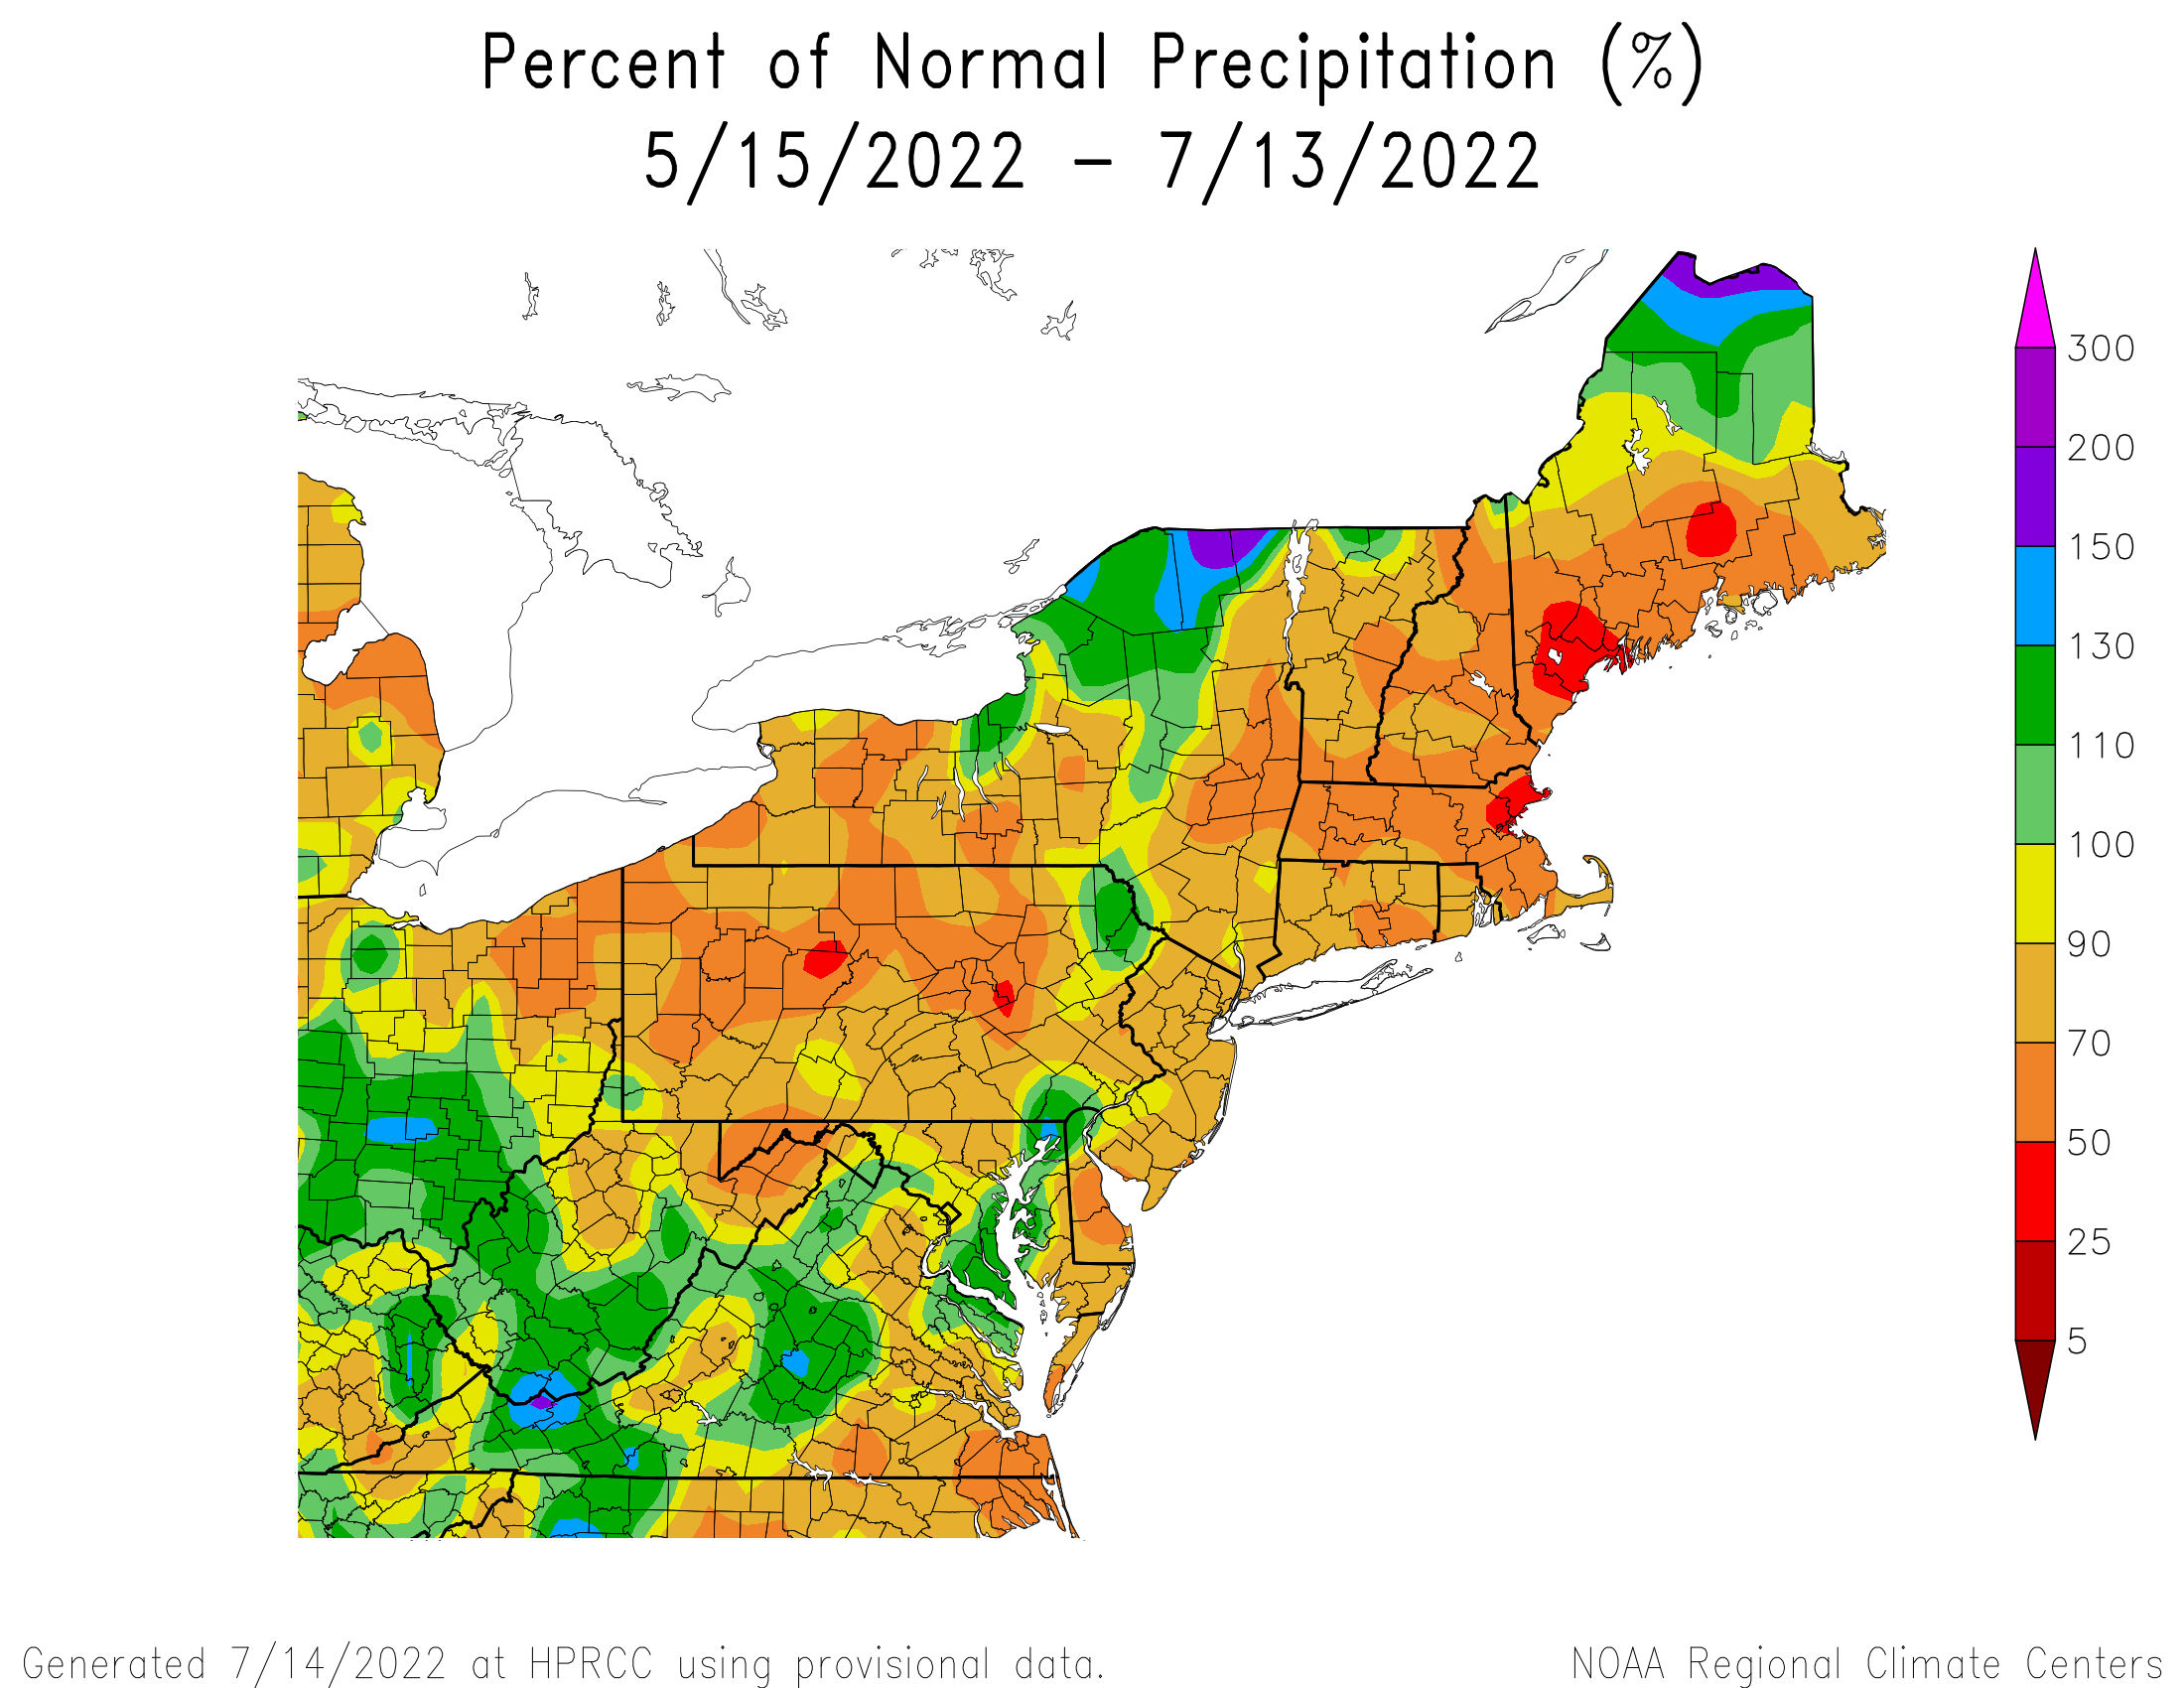 60-Day Precipitation - Percentage of Normal